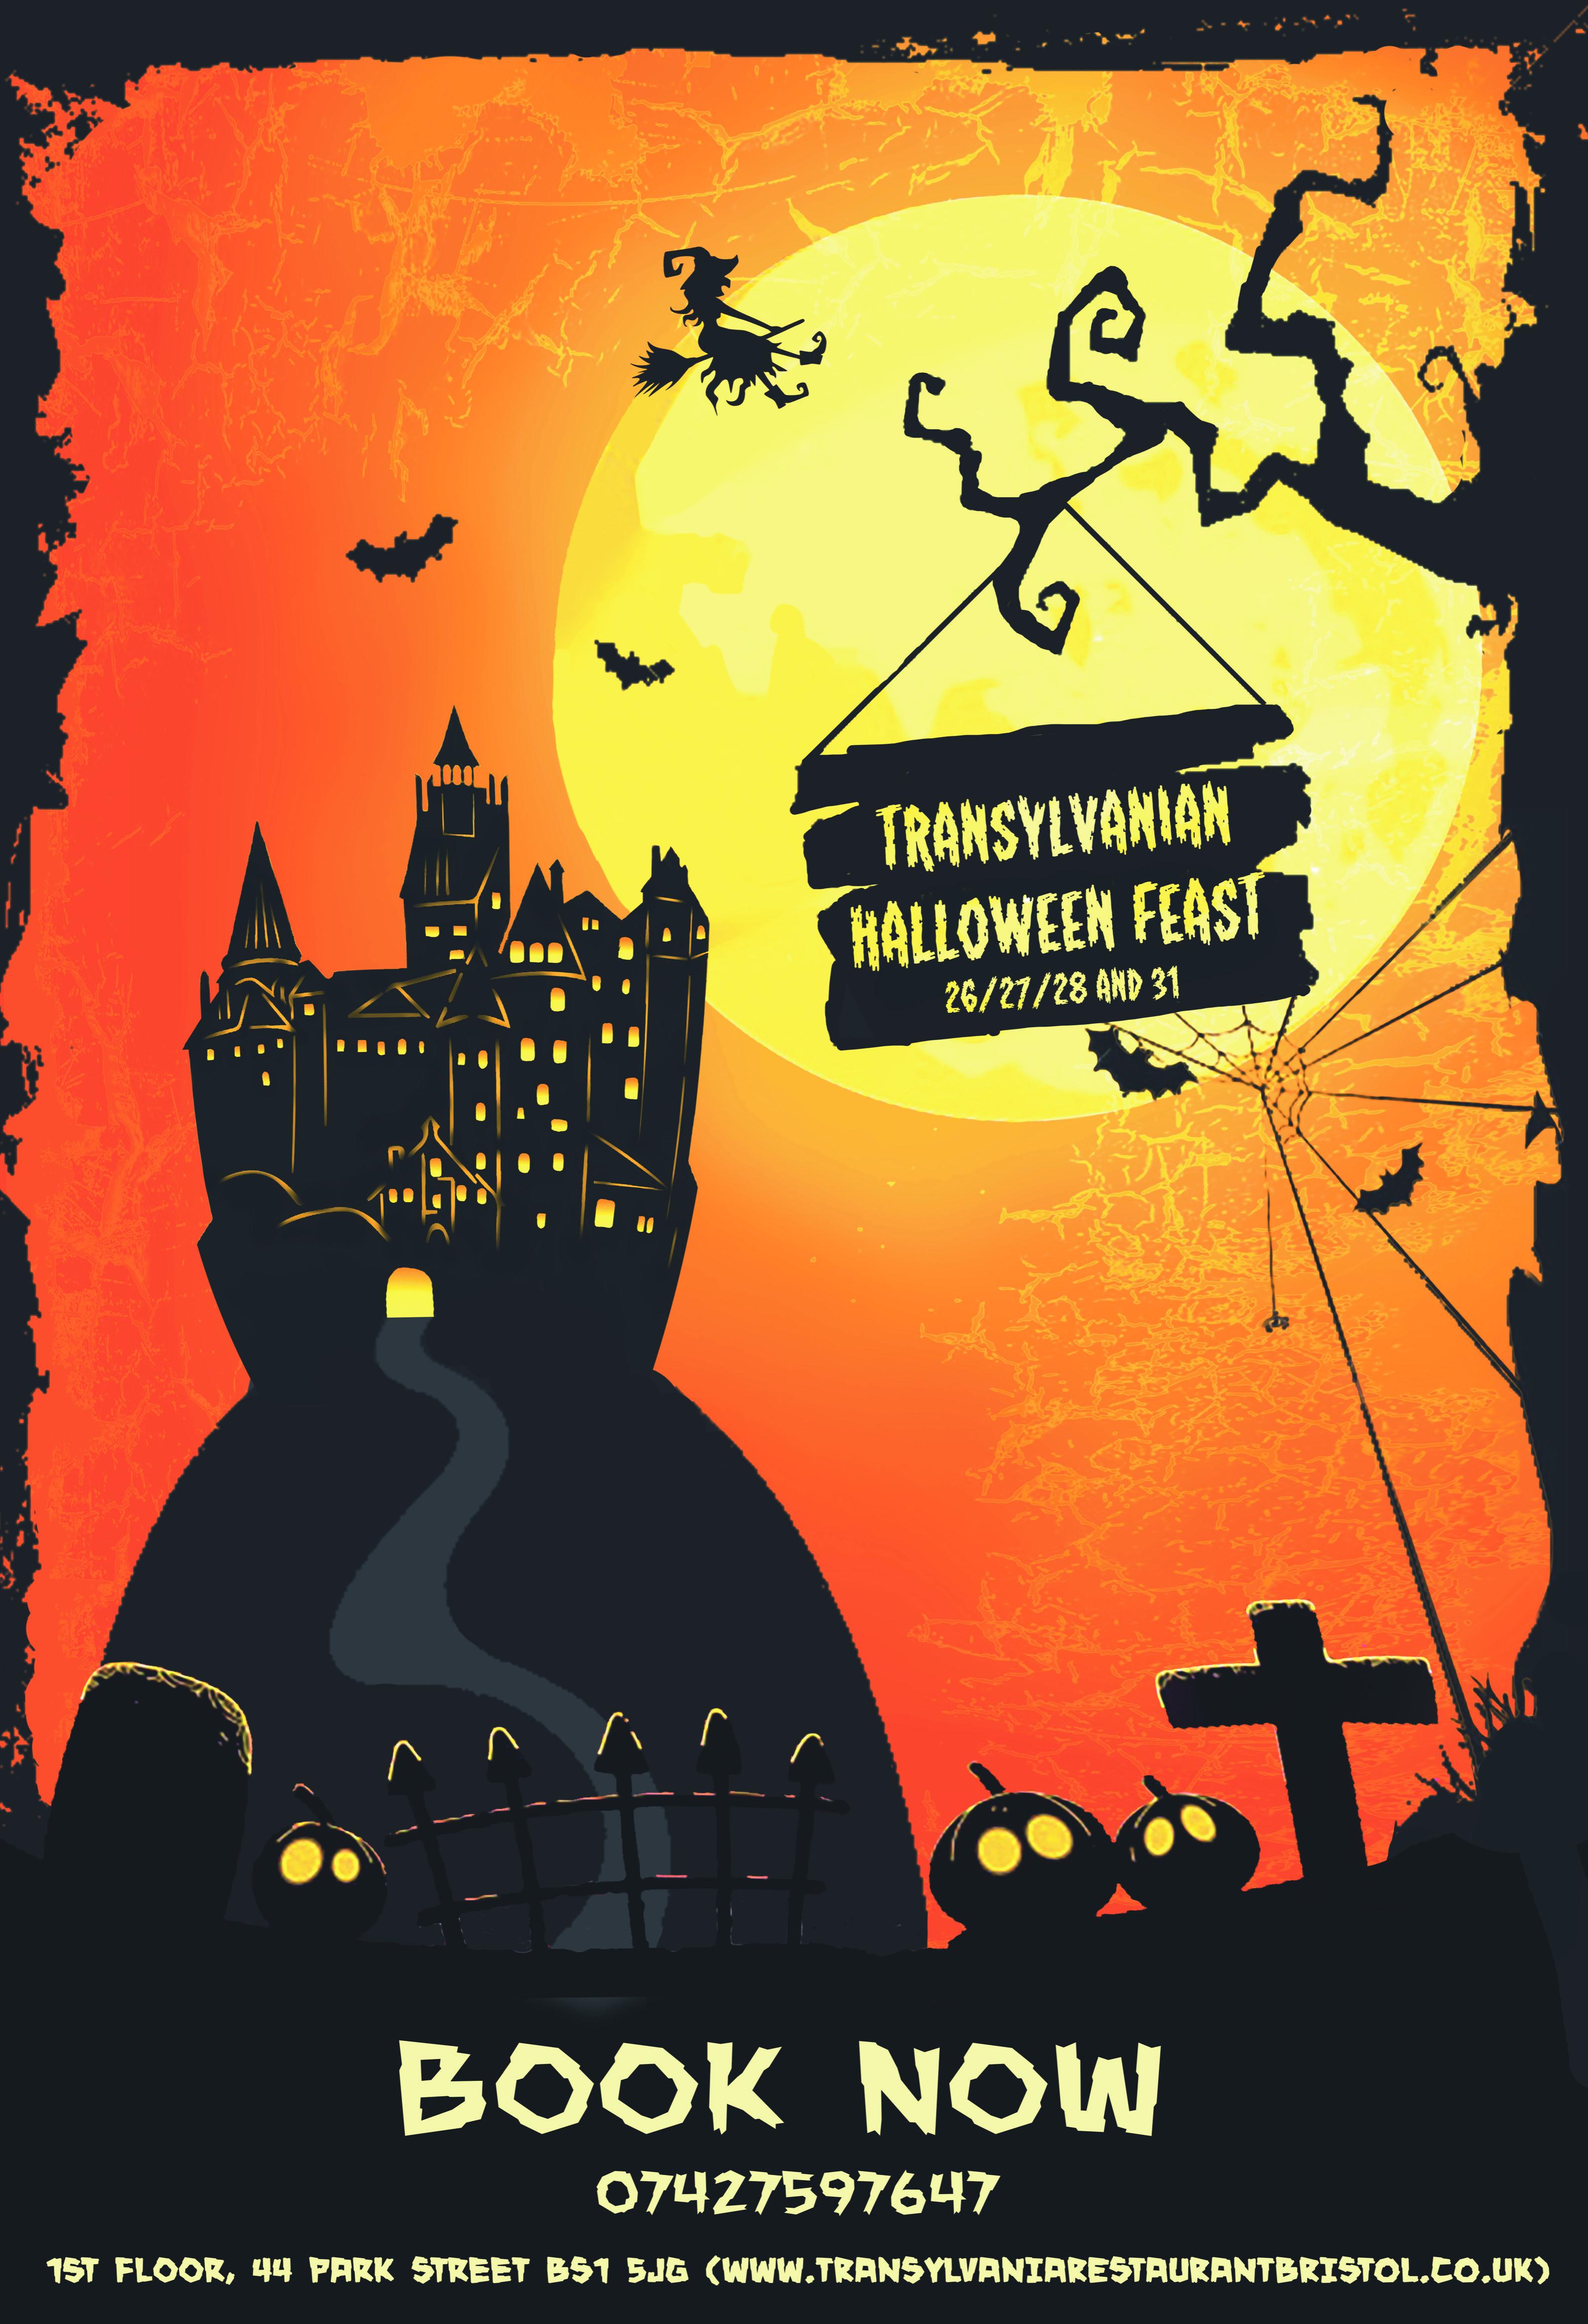 Transylvanian Halloween Feast, 26, 27, 28 & 31 October